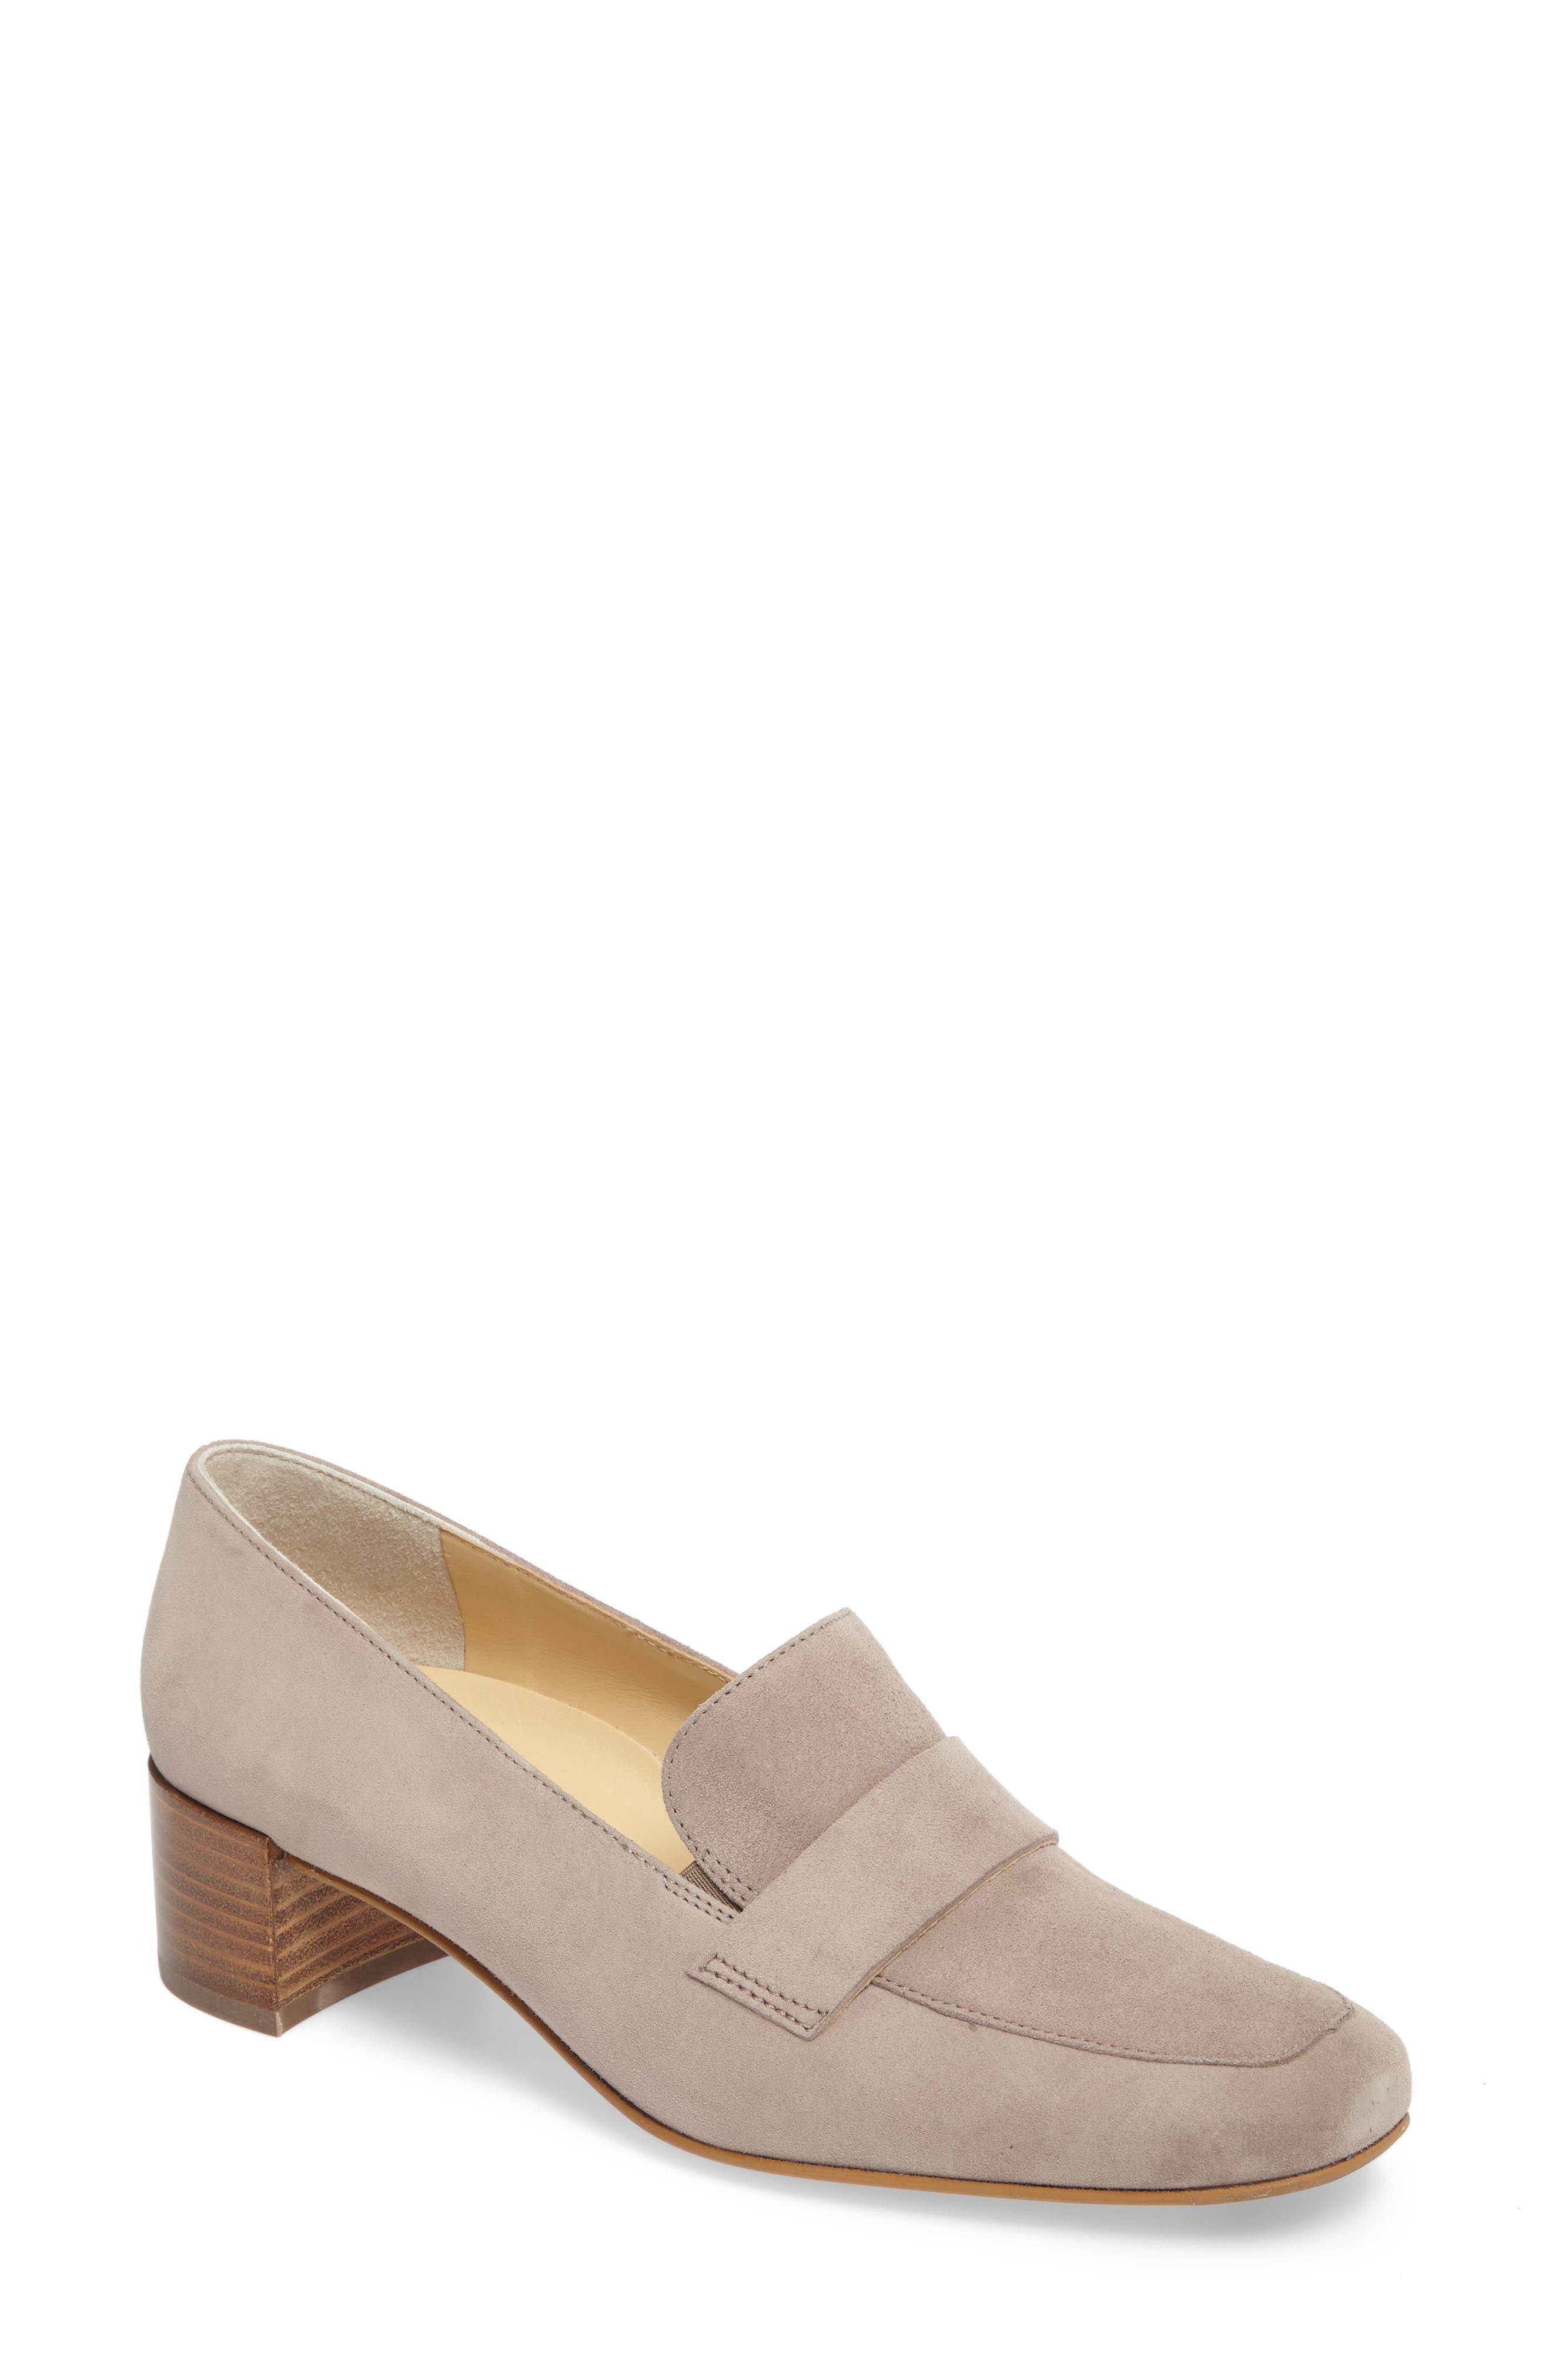 Alternate Image 1 Selected - Paul Green Oscar Block Heel Loafer (Women)